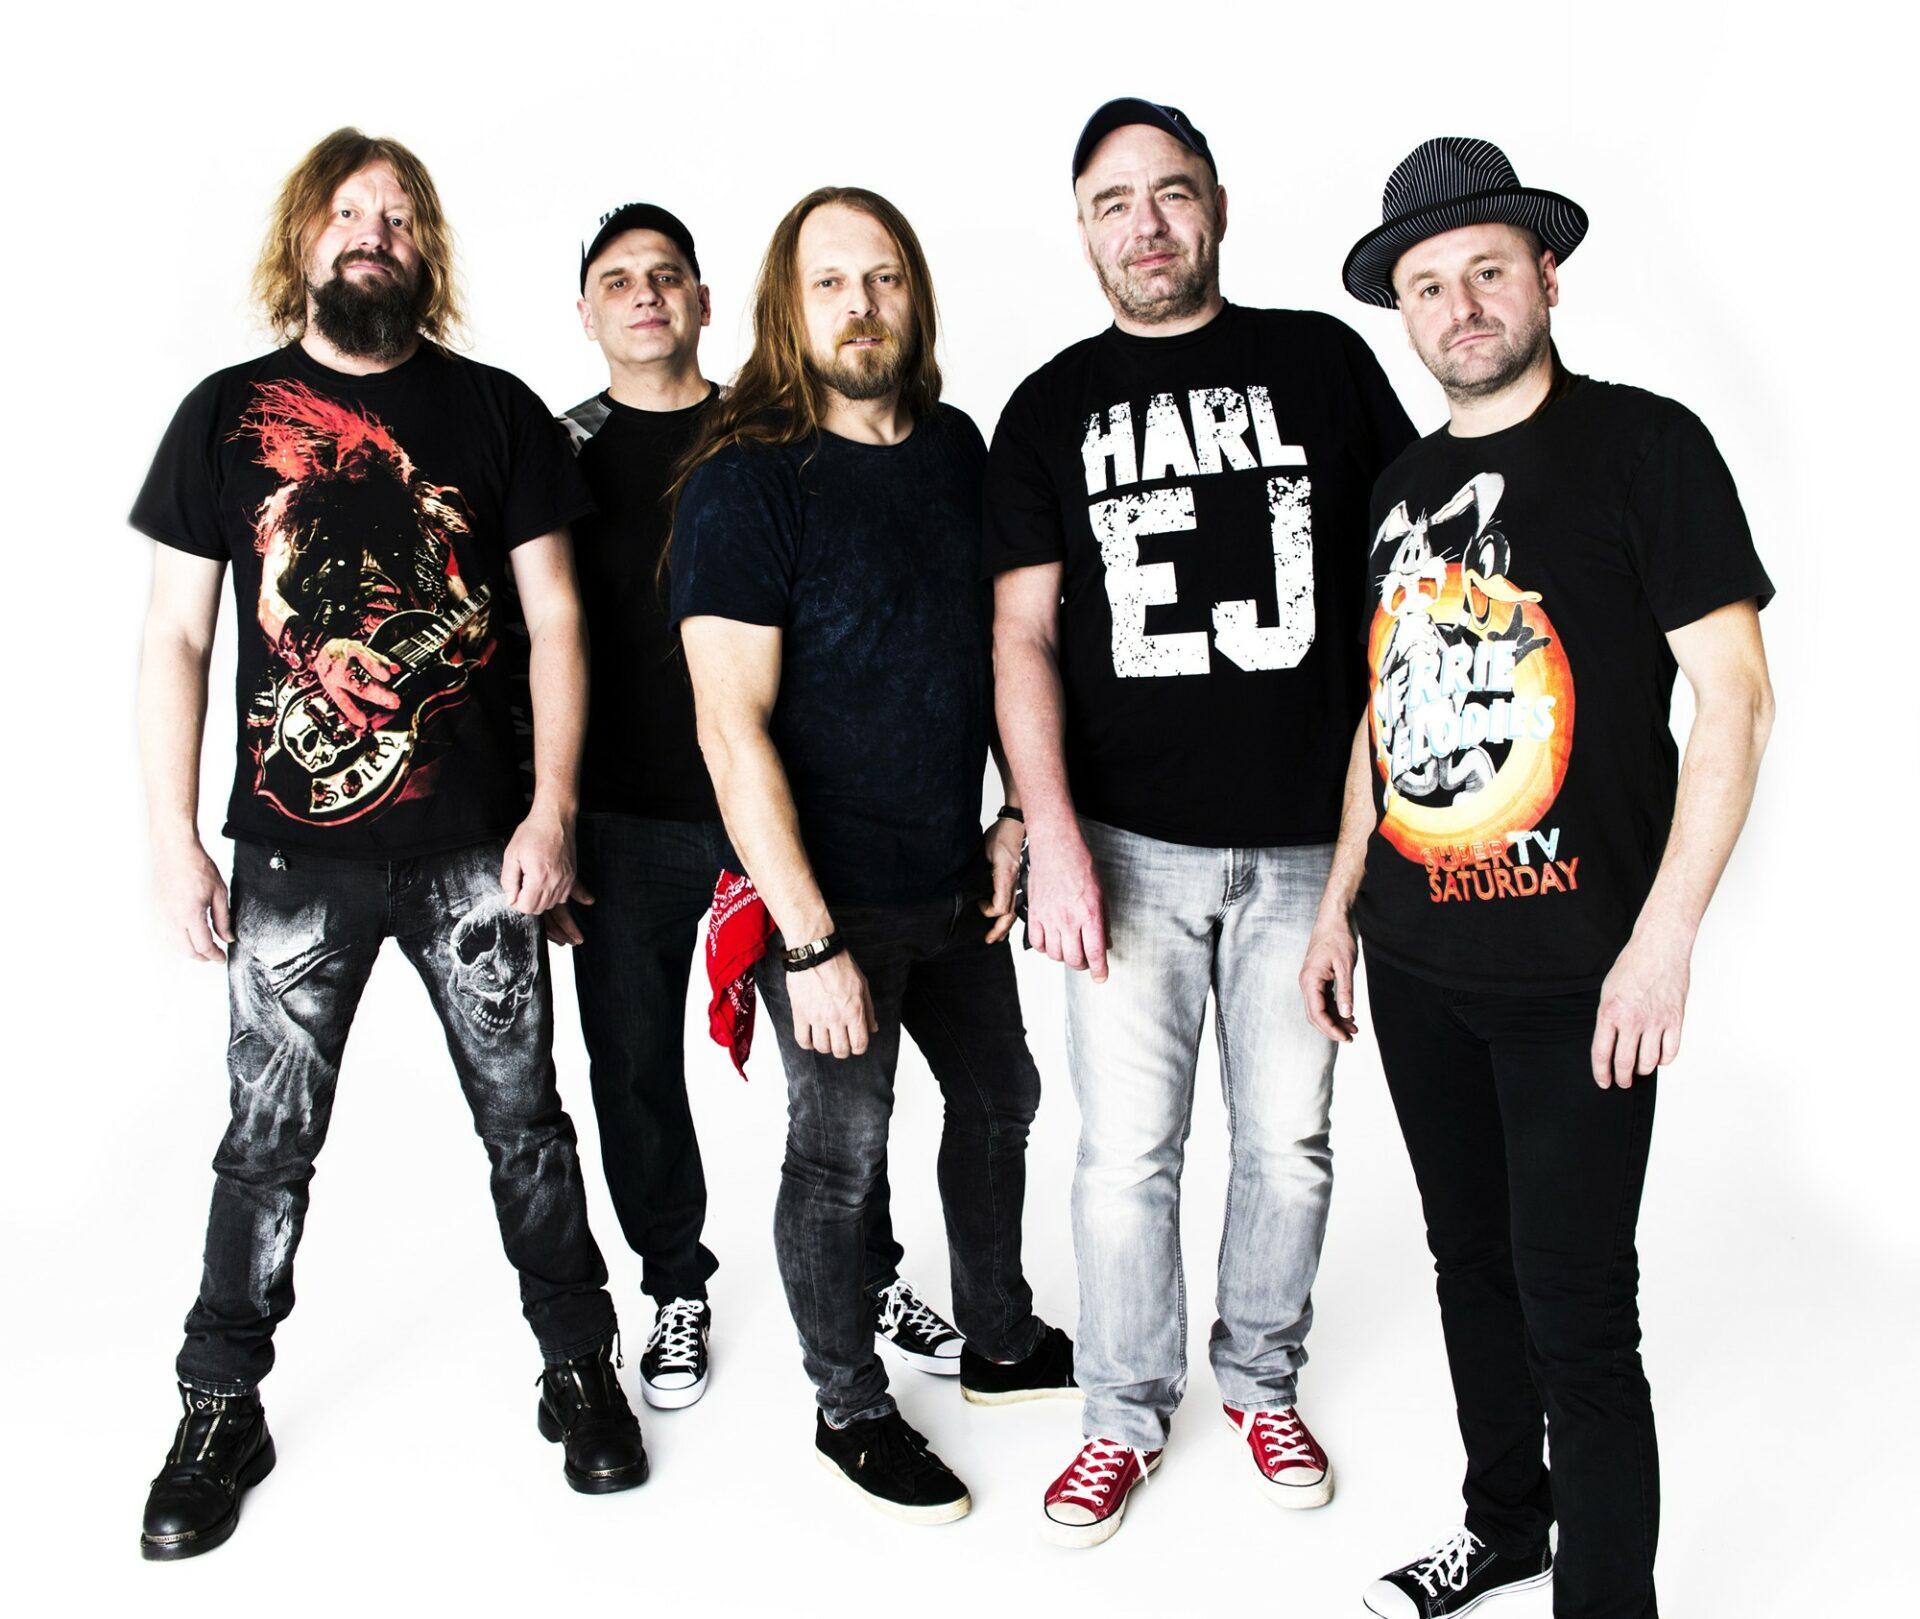 Skupina Harlej oslavuje 25 rokov existencie